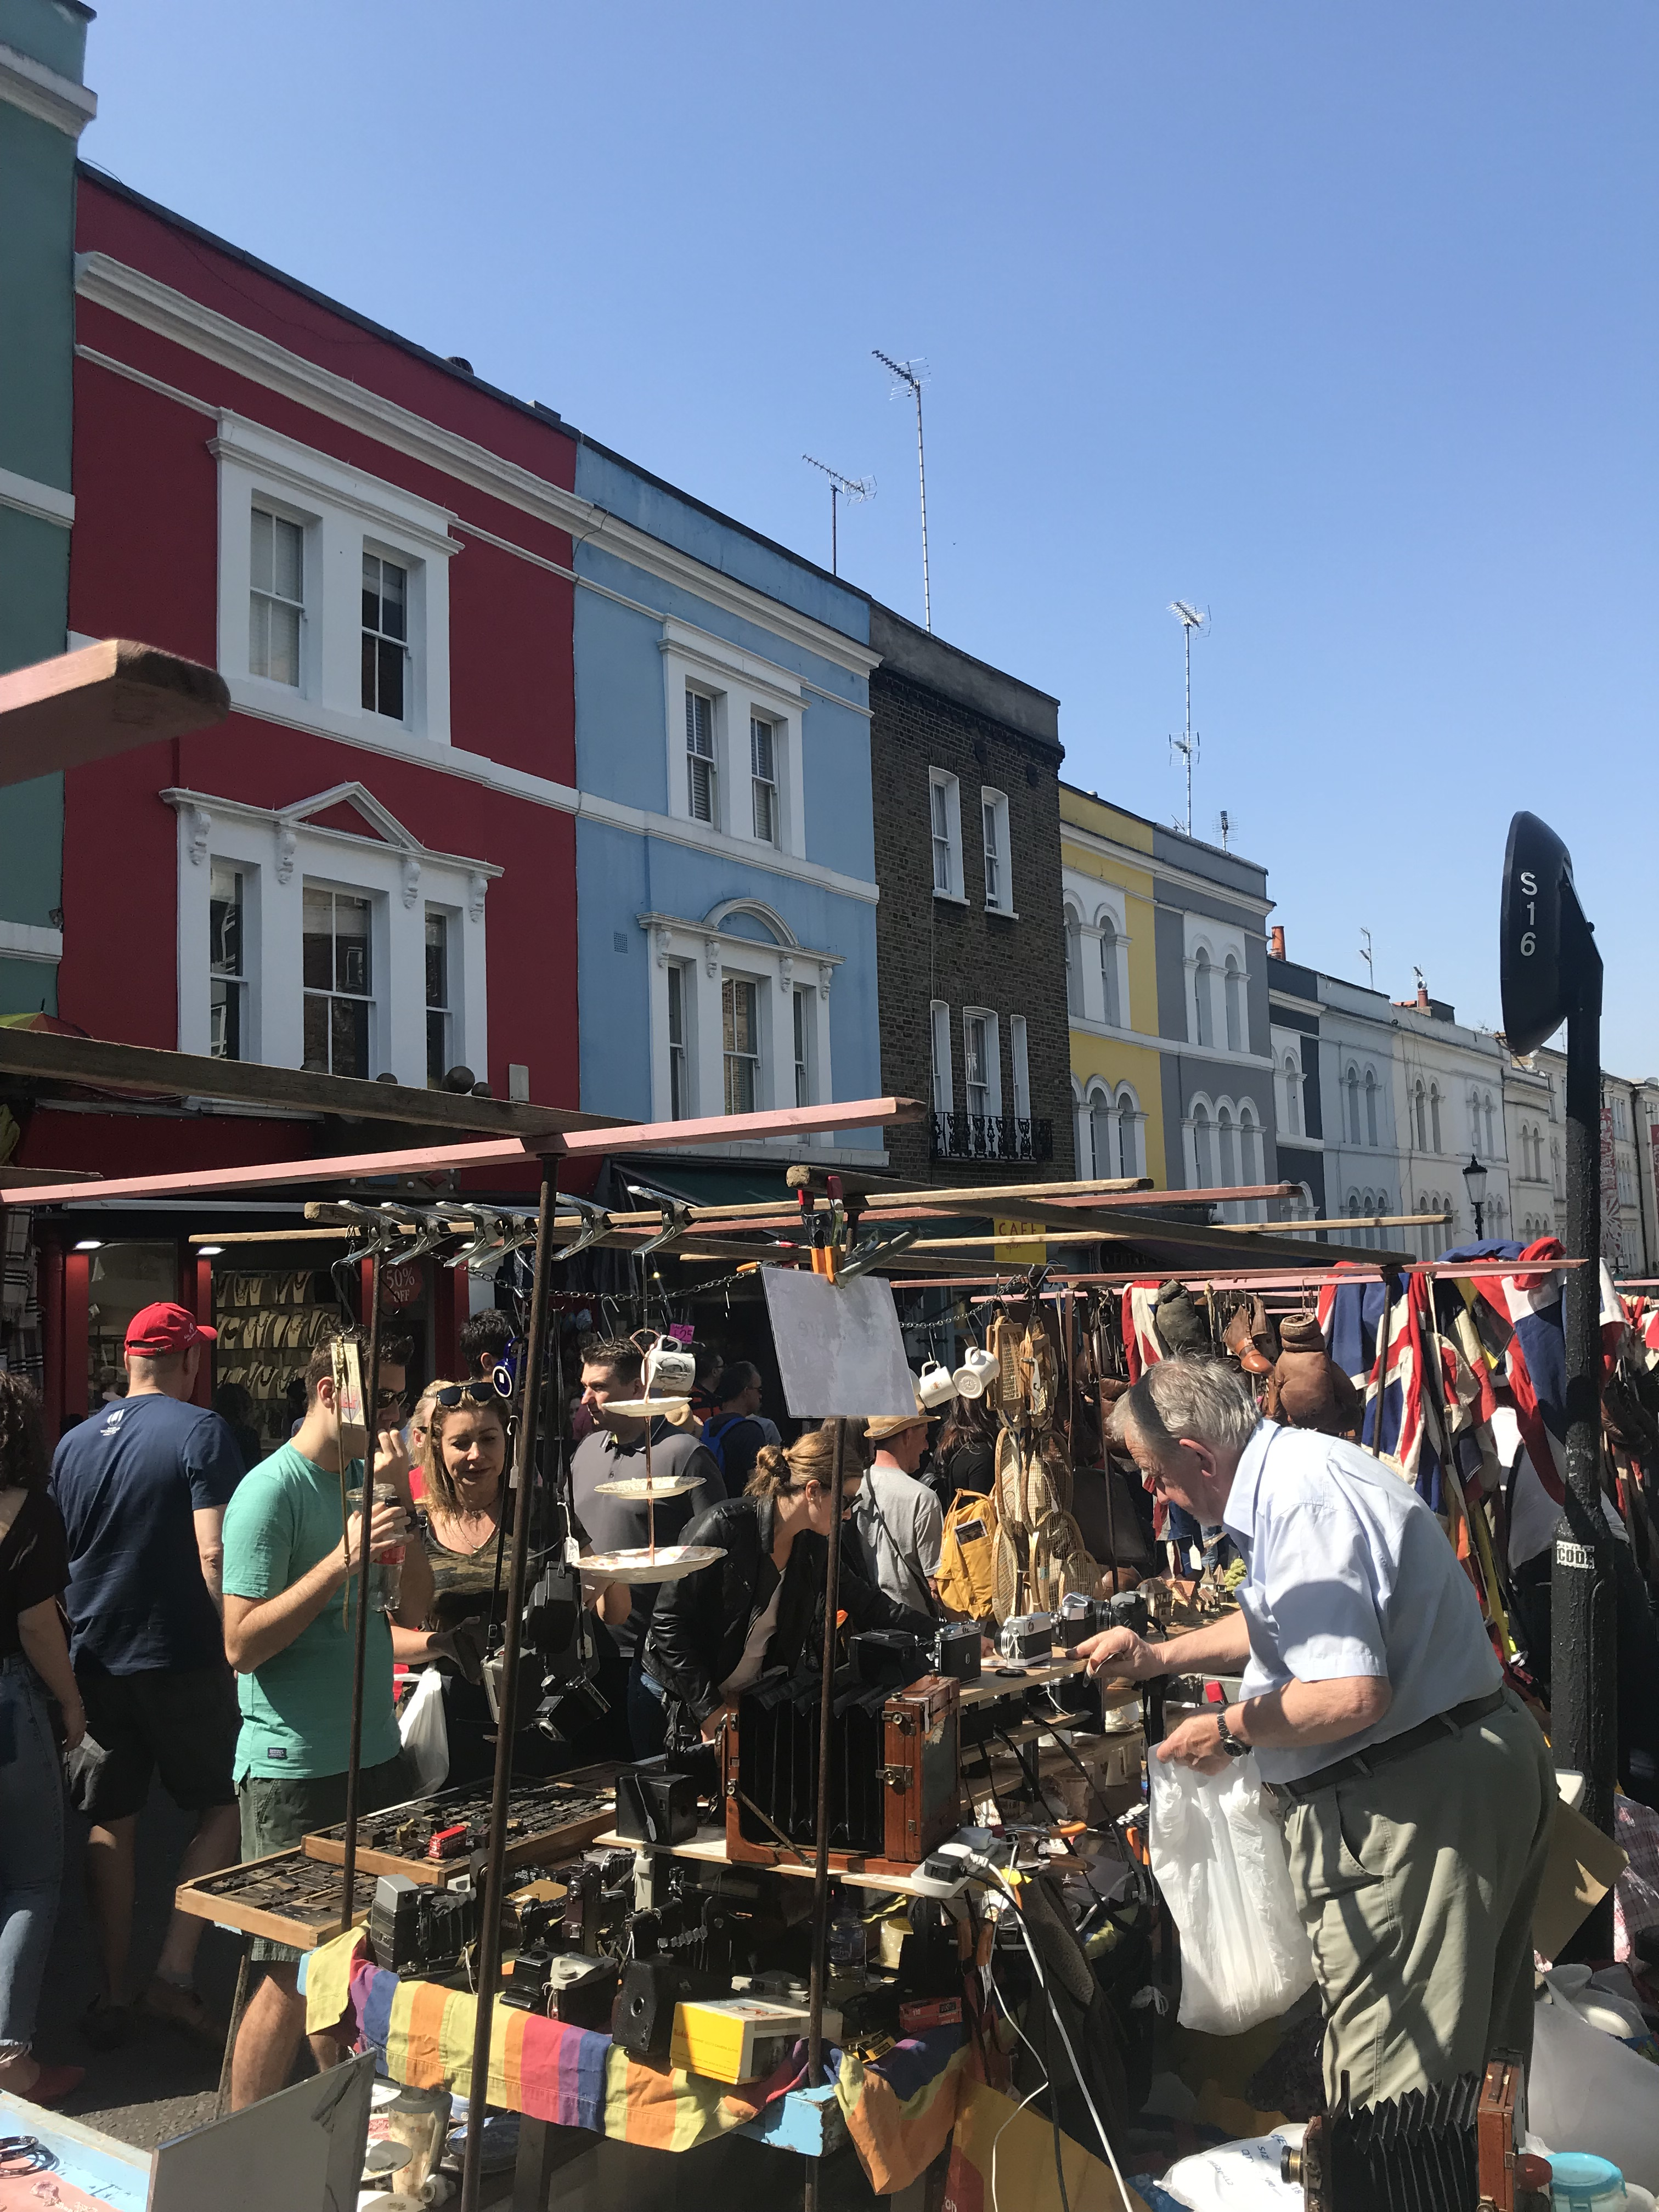 mercato-portobello-notting-hill-londra